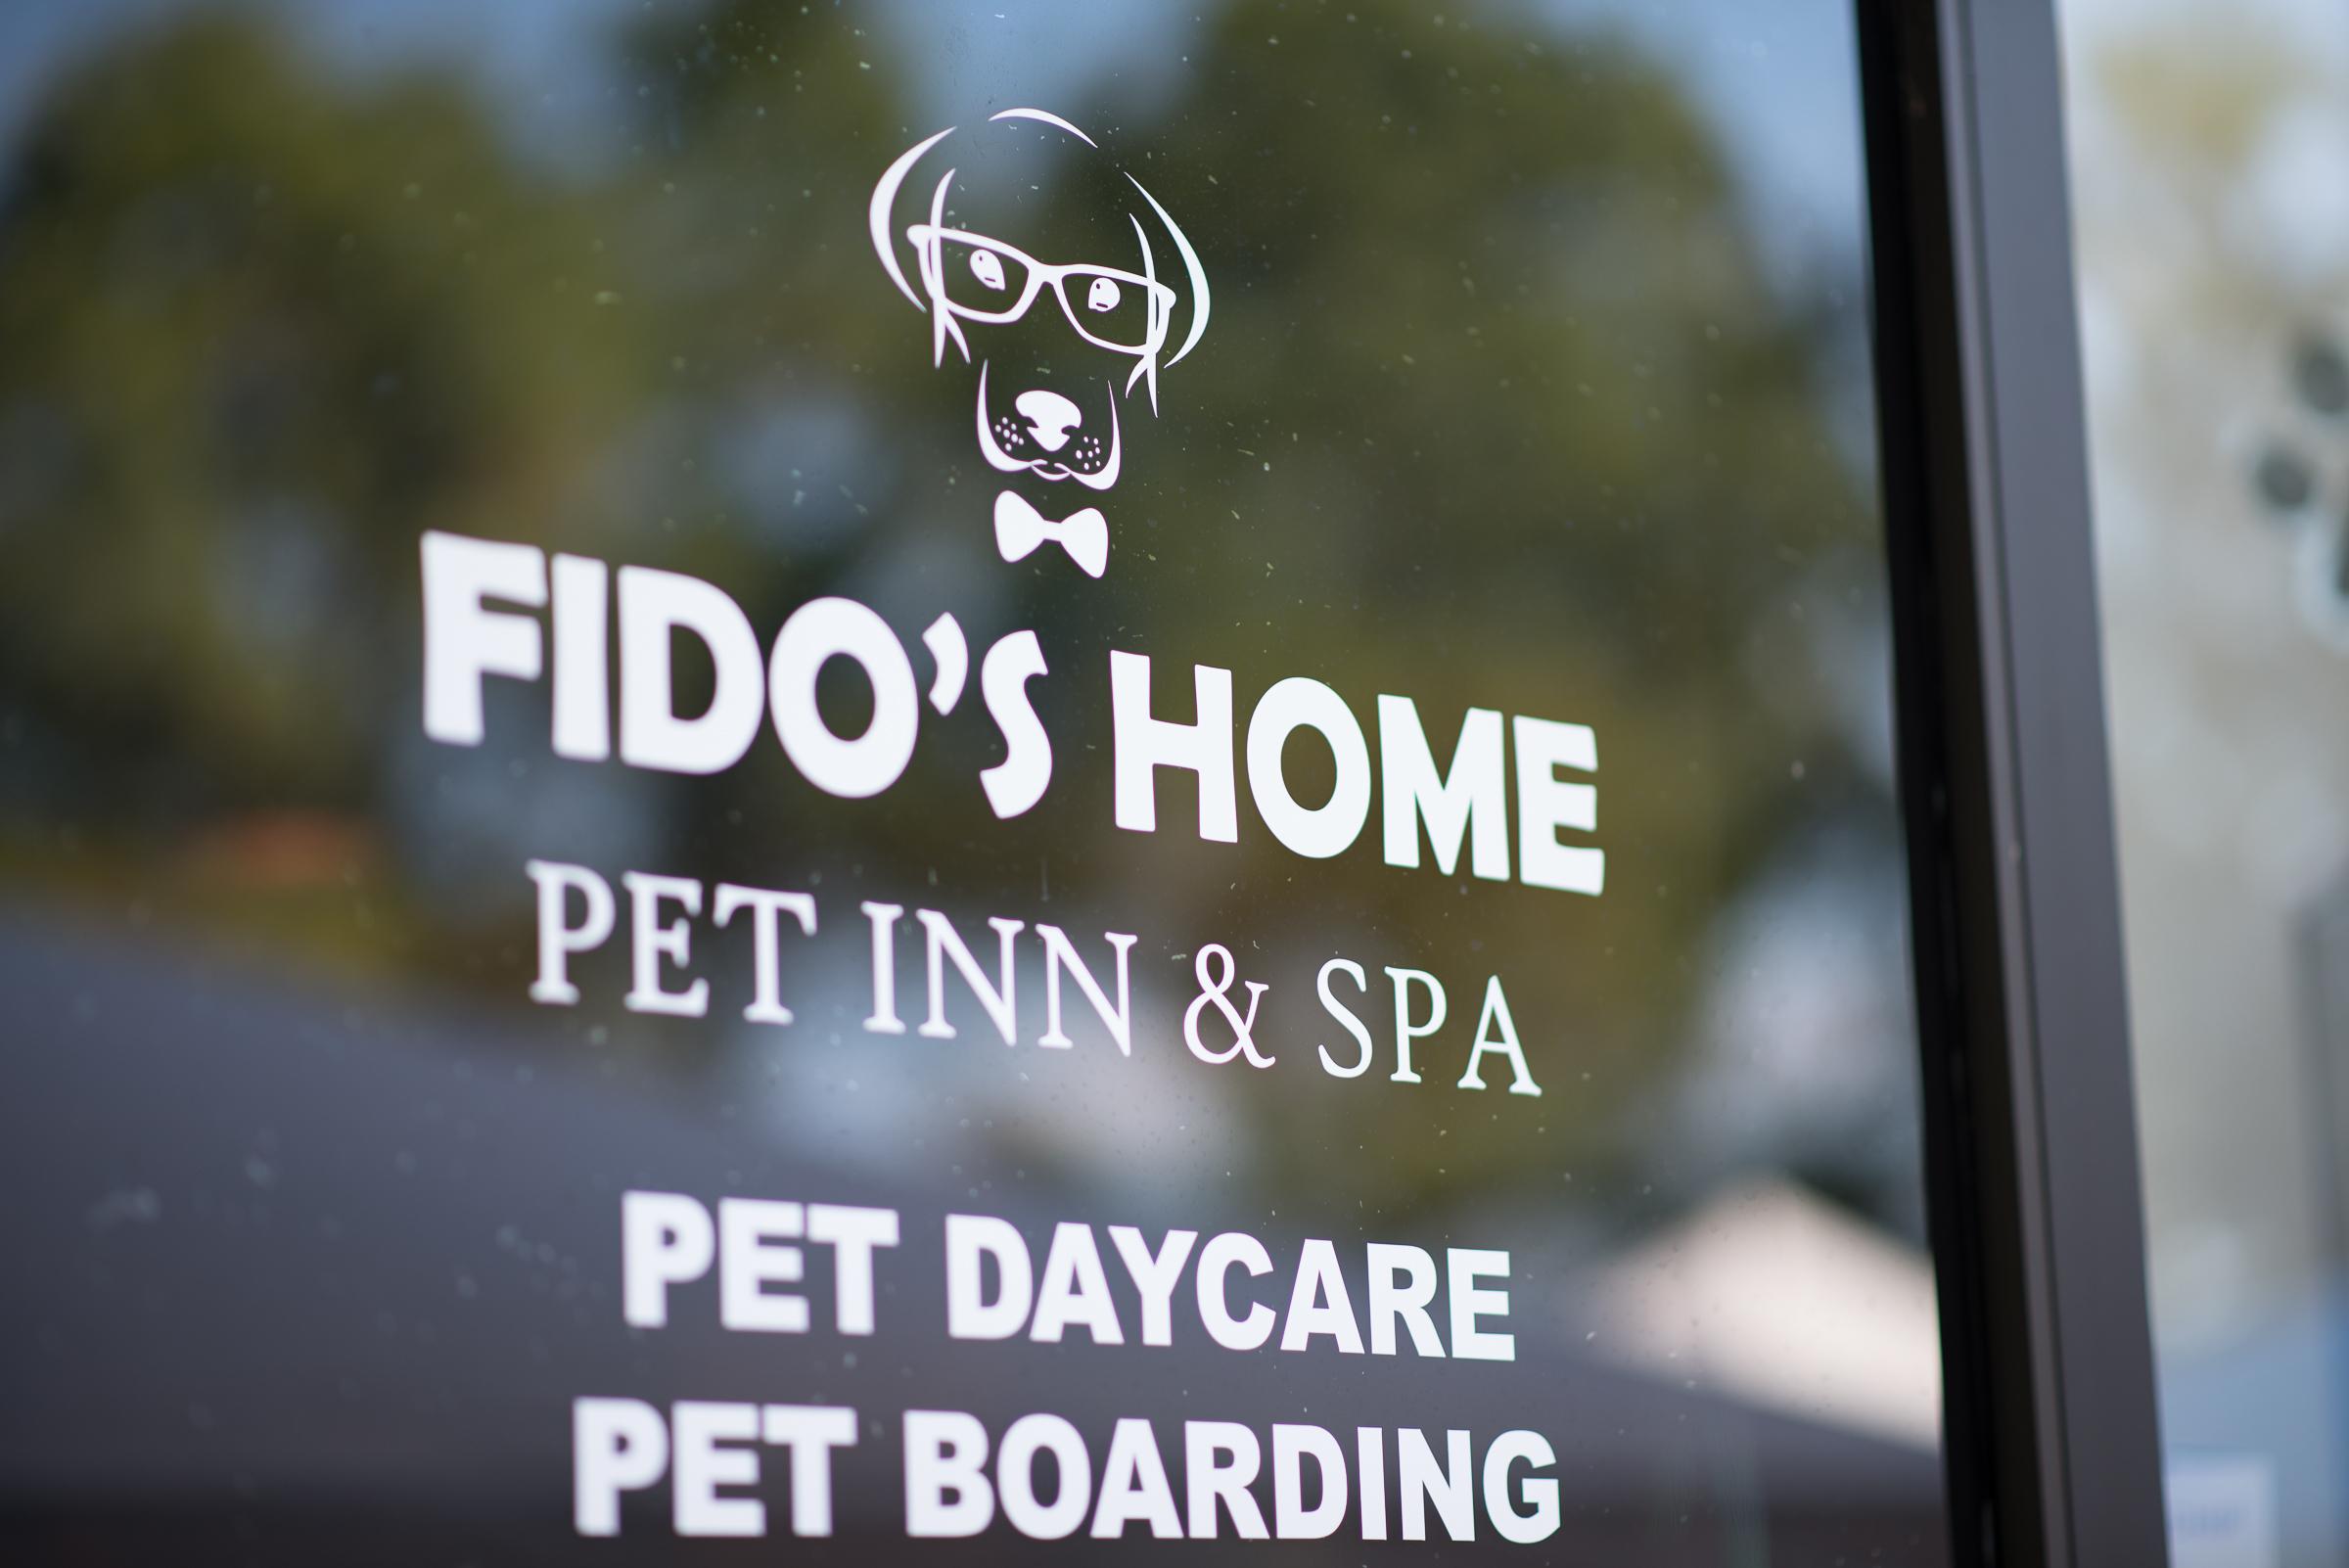 Dog S Day Inn Pet Resort Katy Tx Katy Tx